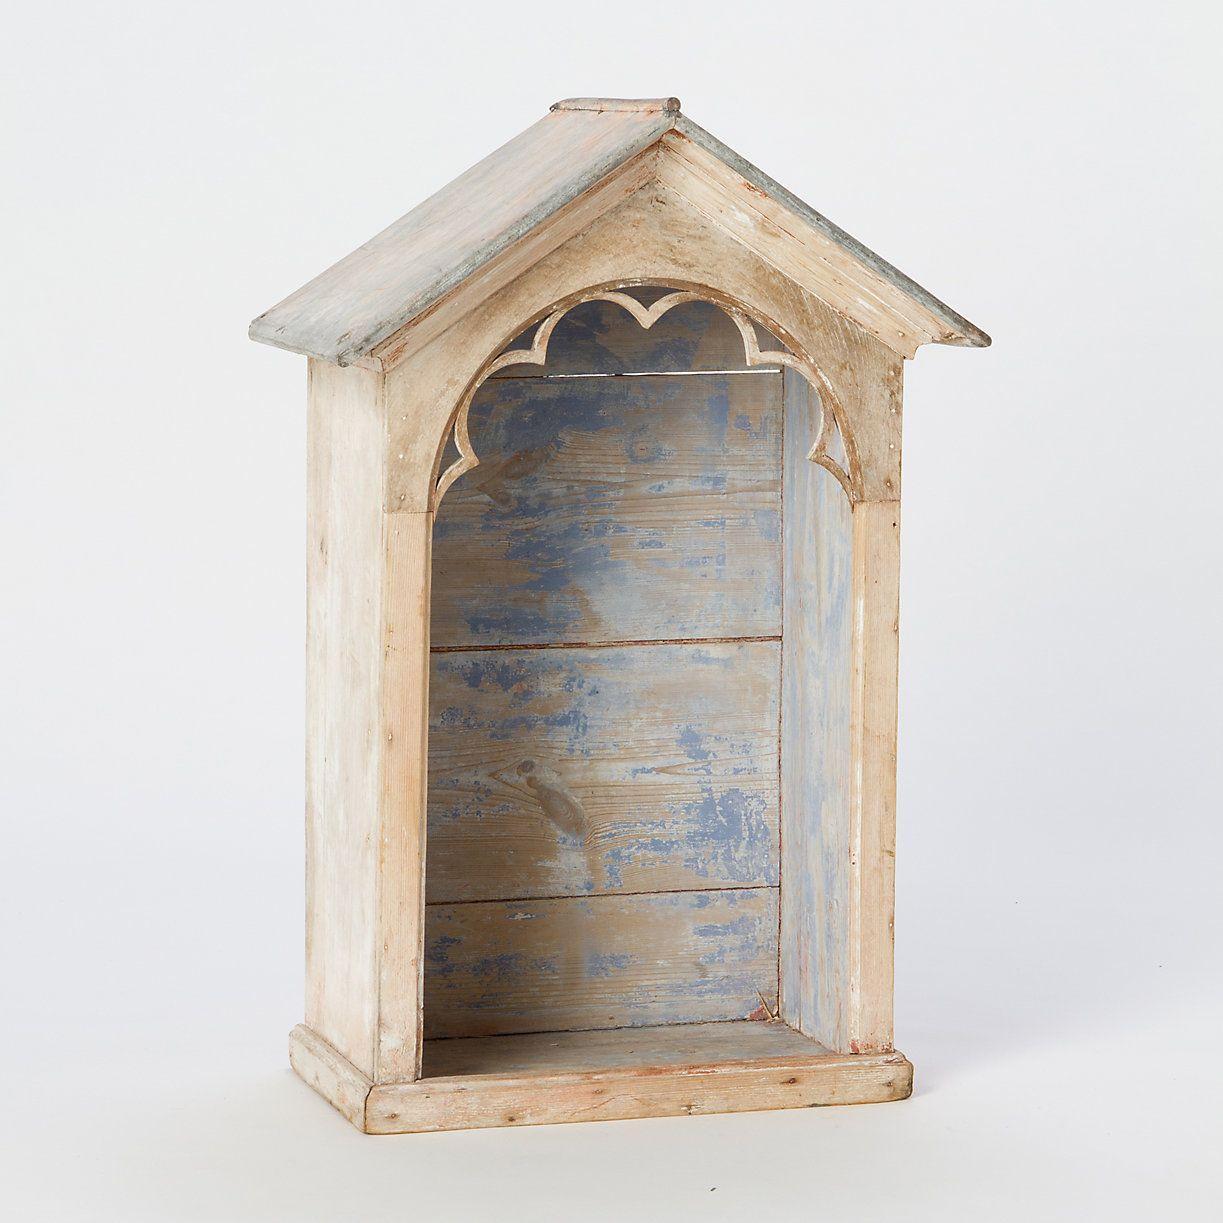 Terrain Home Decor: Vintage Scalloped Shrine In House+Home HOME+DÉCOR Room